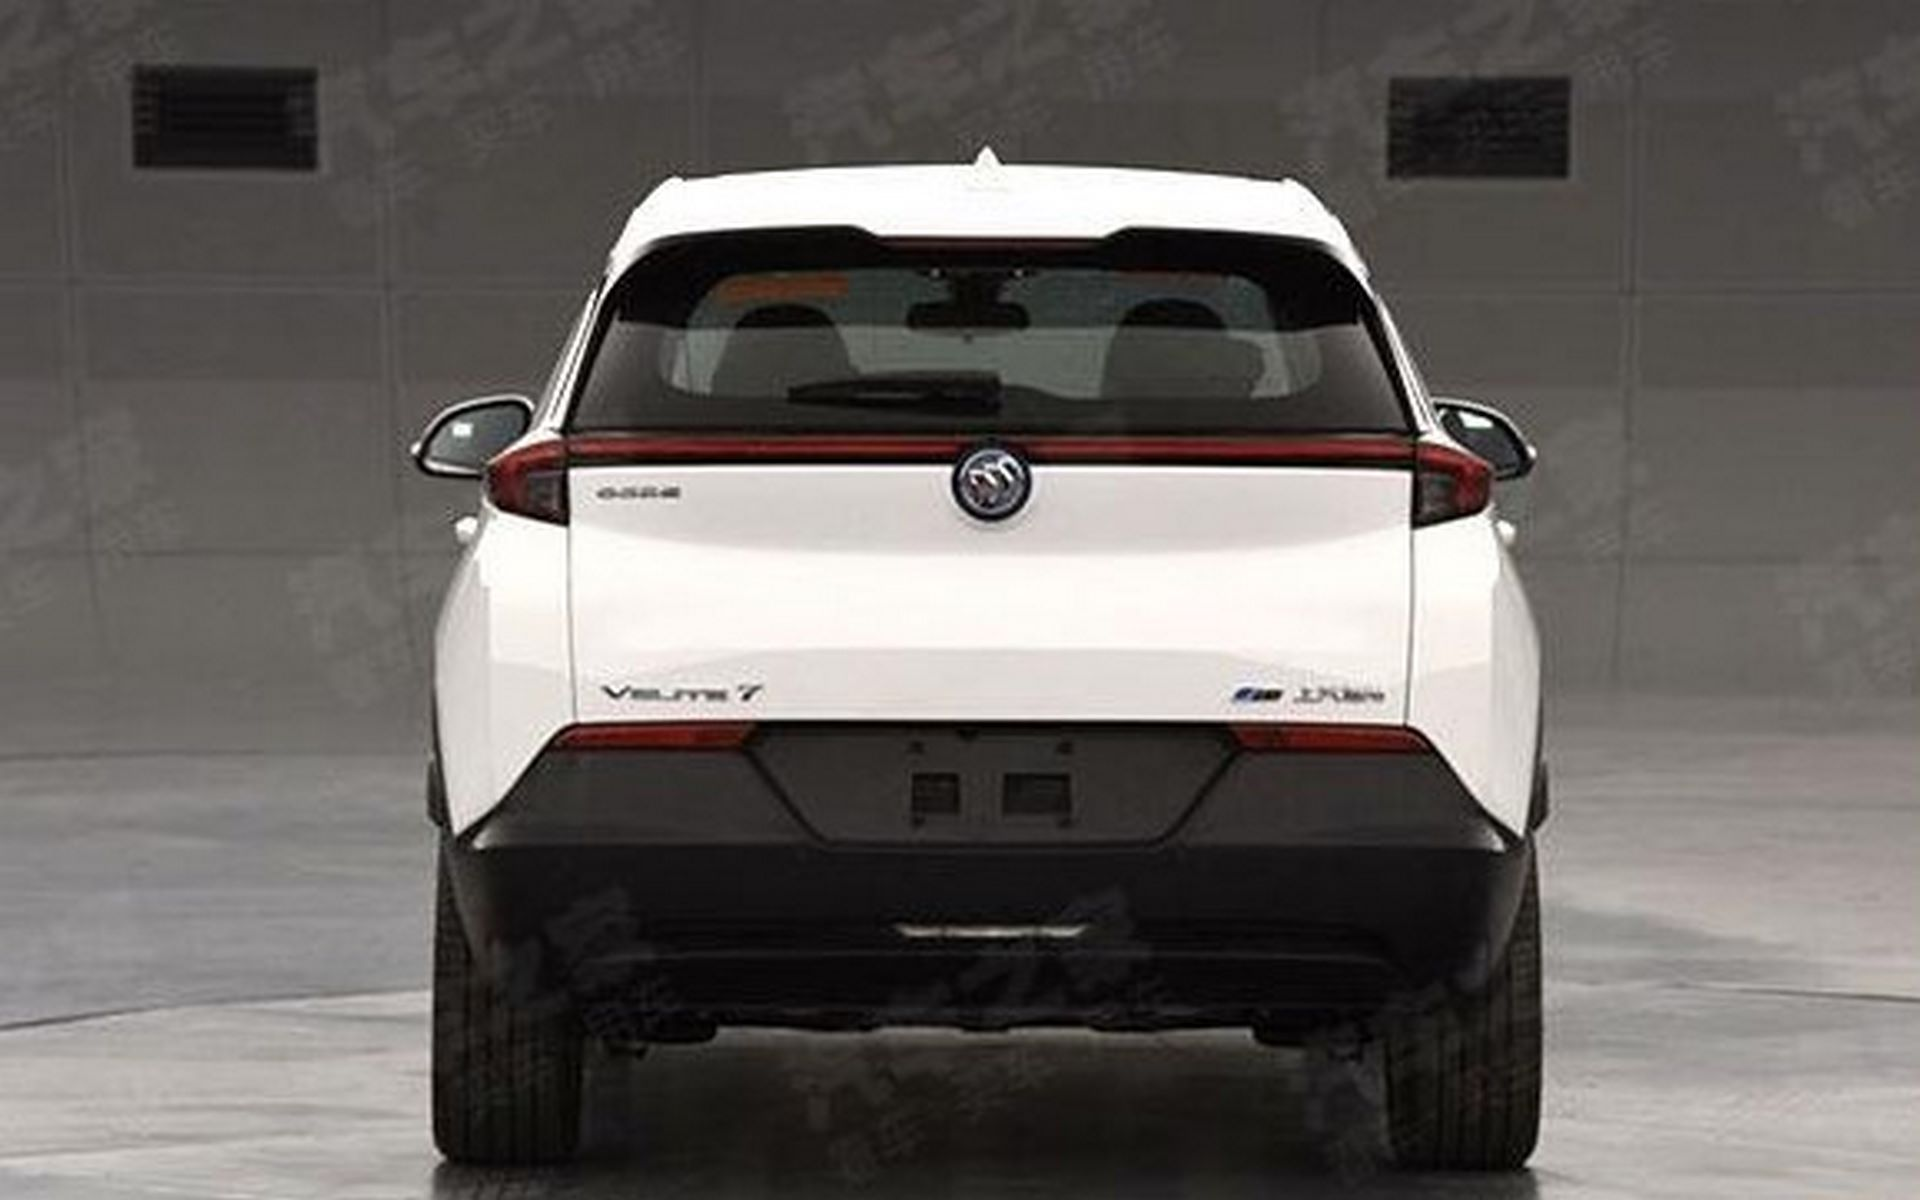 Chevyrolet-Bolt-crossover-2021-Buick-Velite-7-3-1